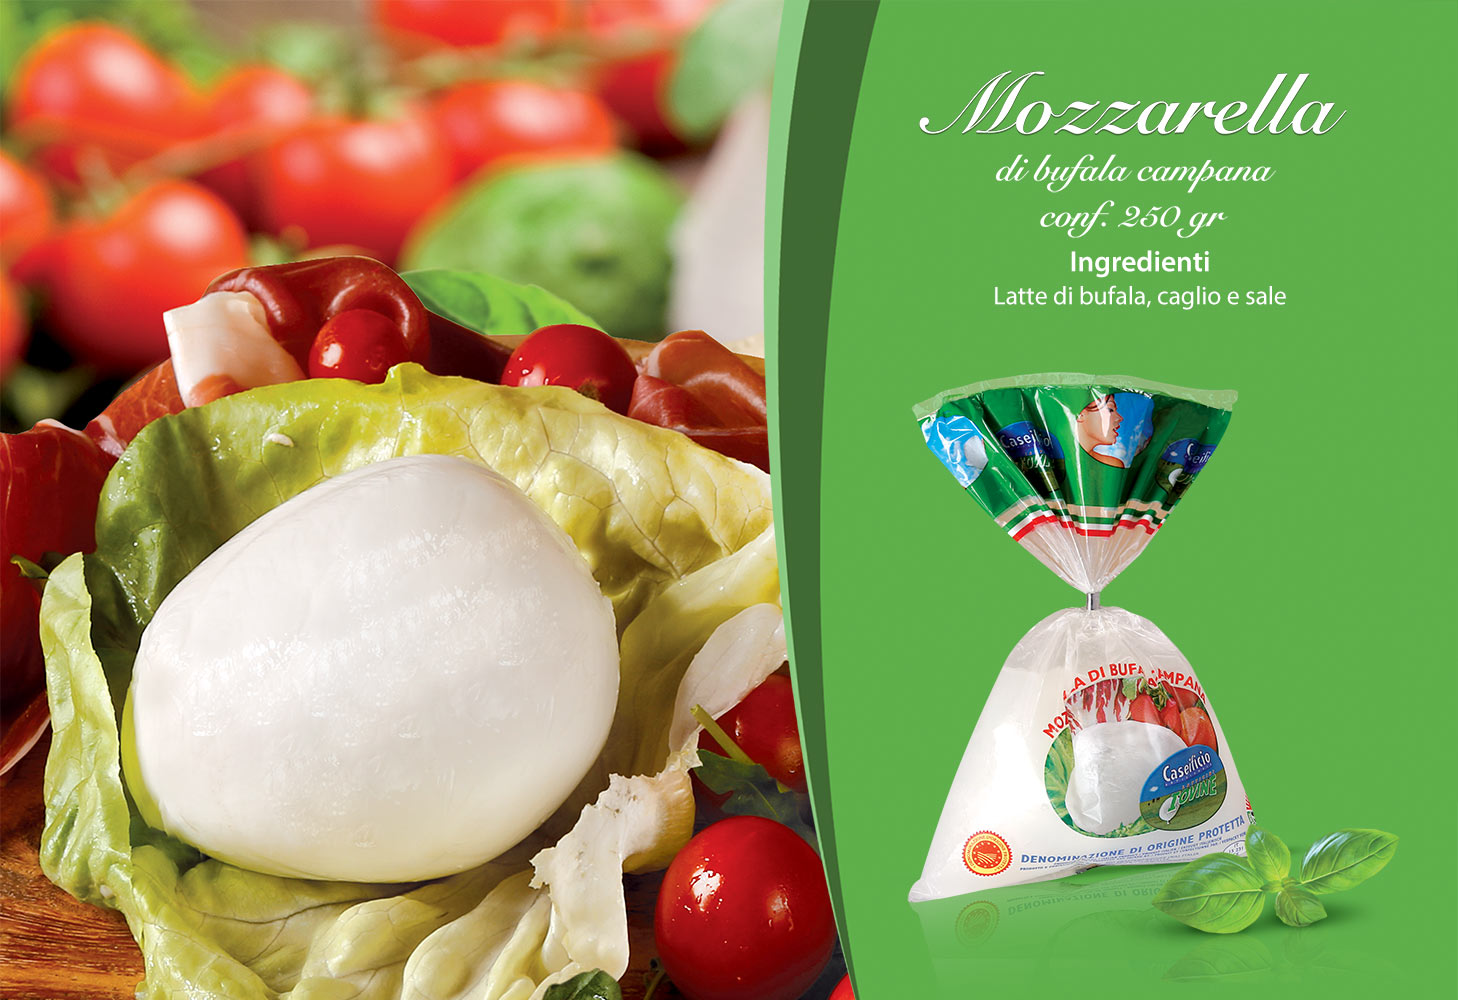 06Mozzarella31